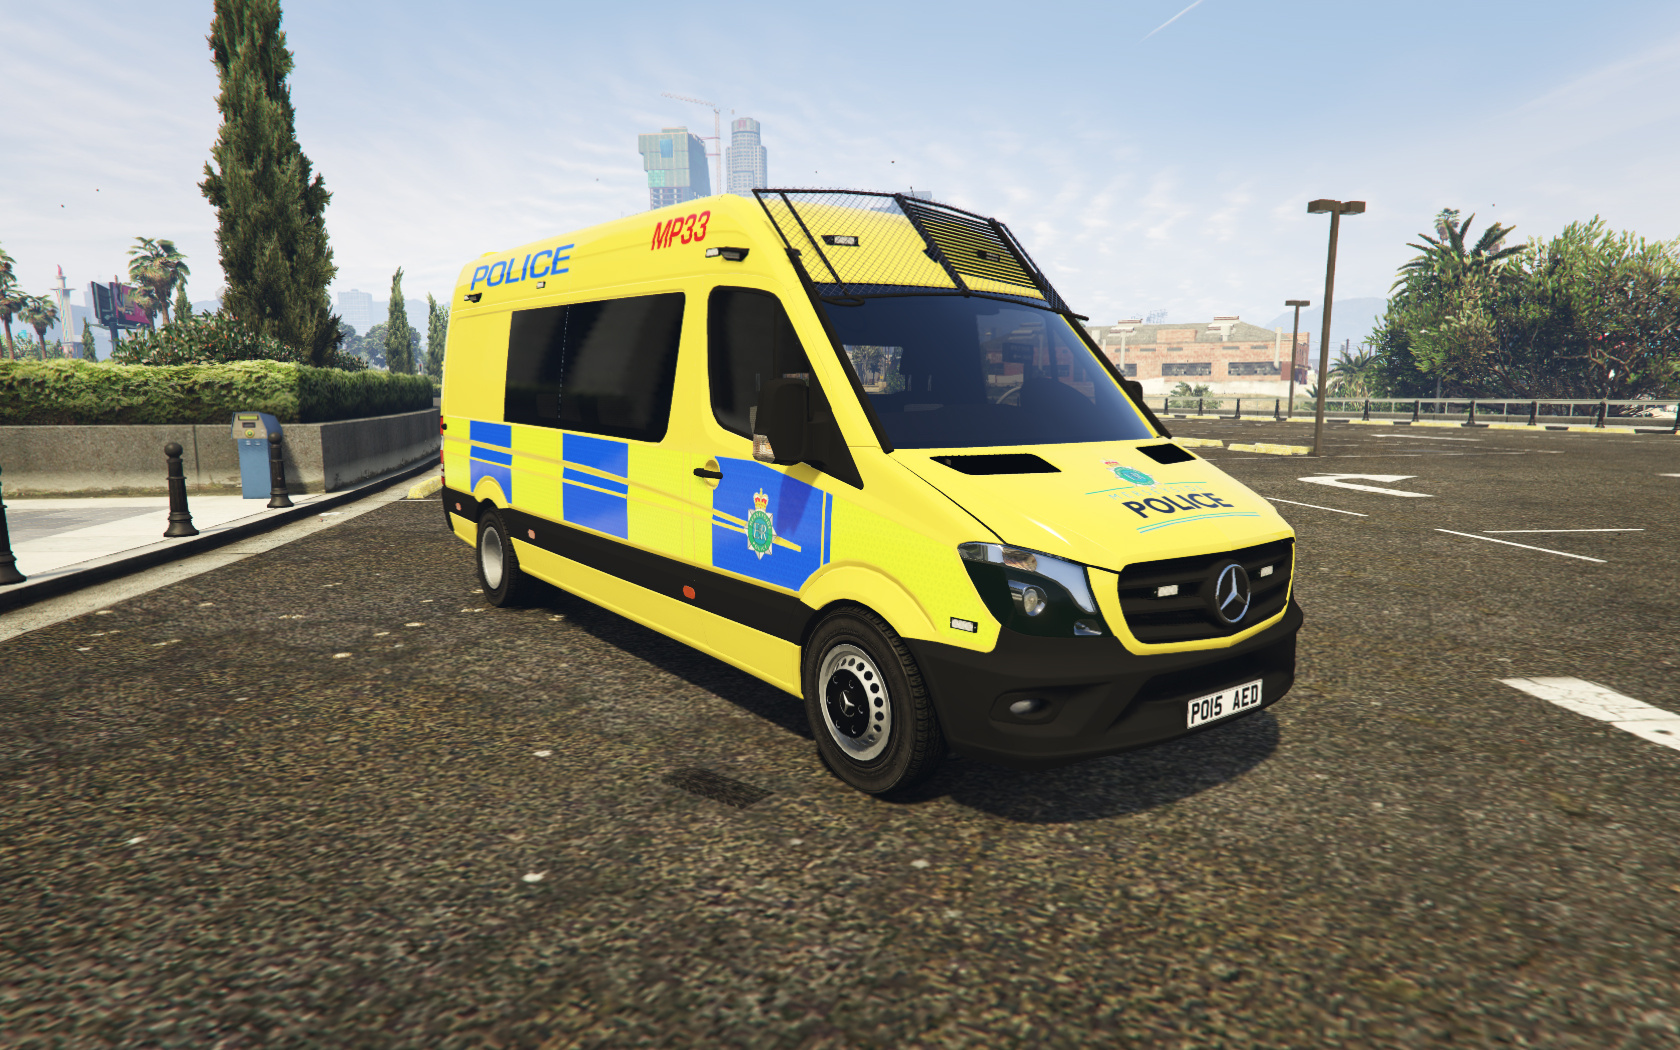 Merseyside Police Public Order Van Skin Gta5 Mods Com